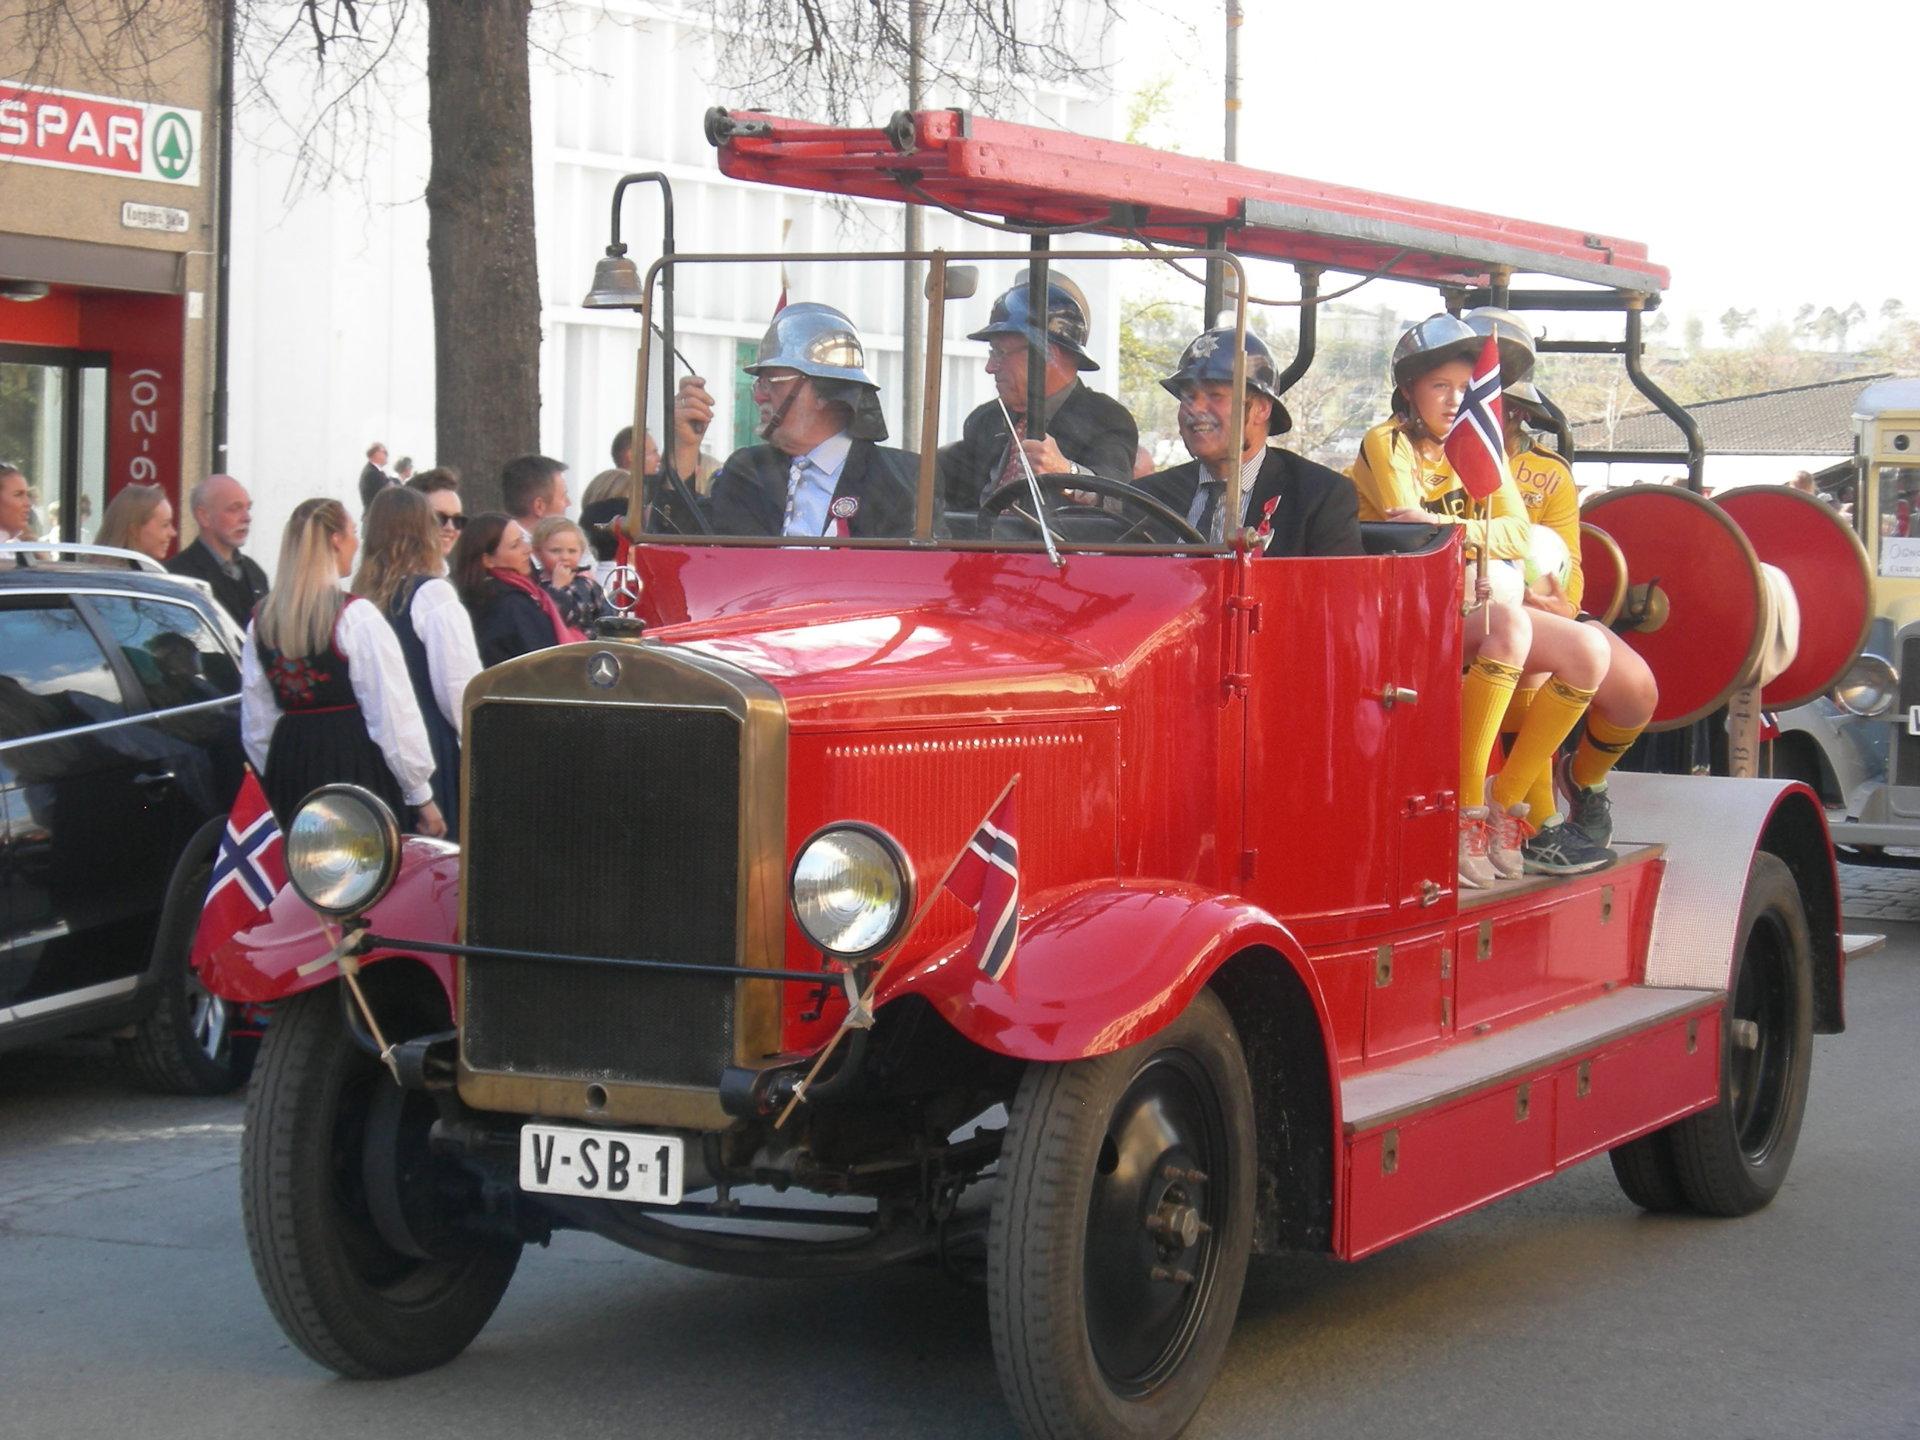 Brannbilen i 17.mai pynt